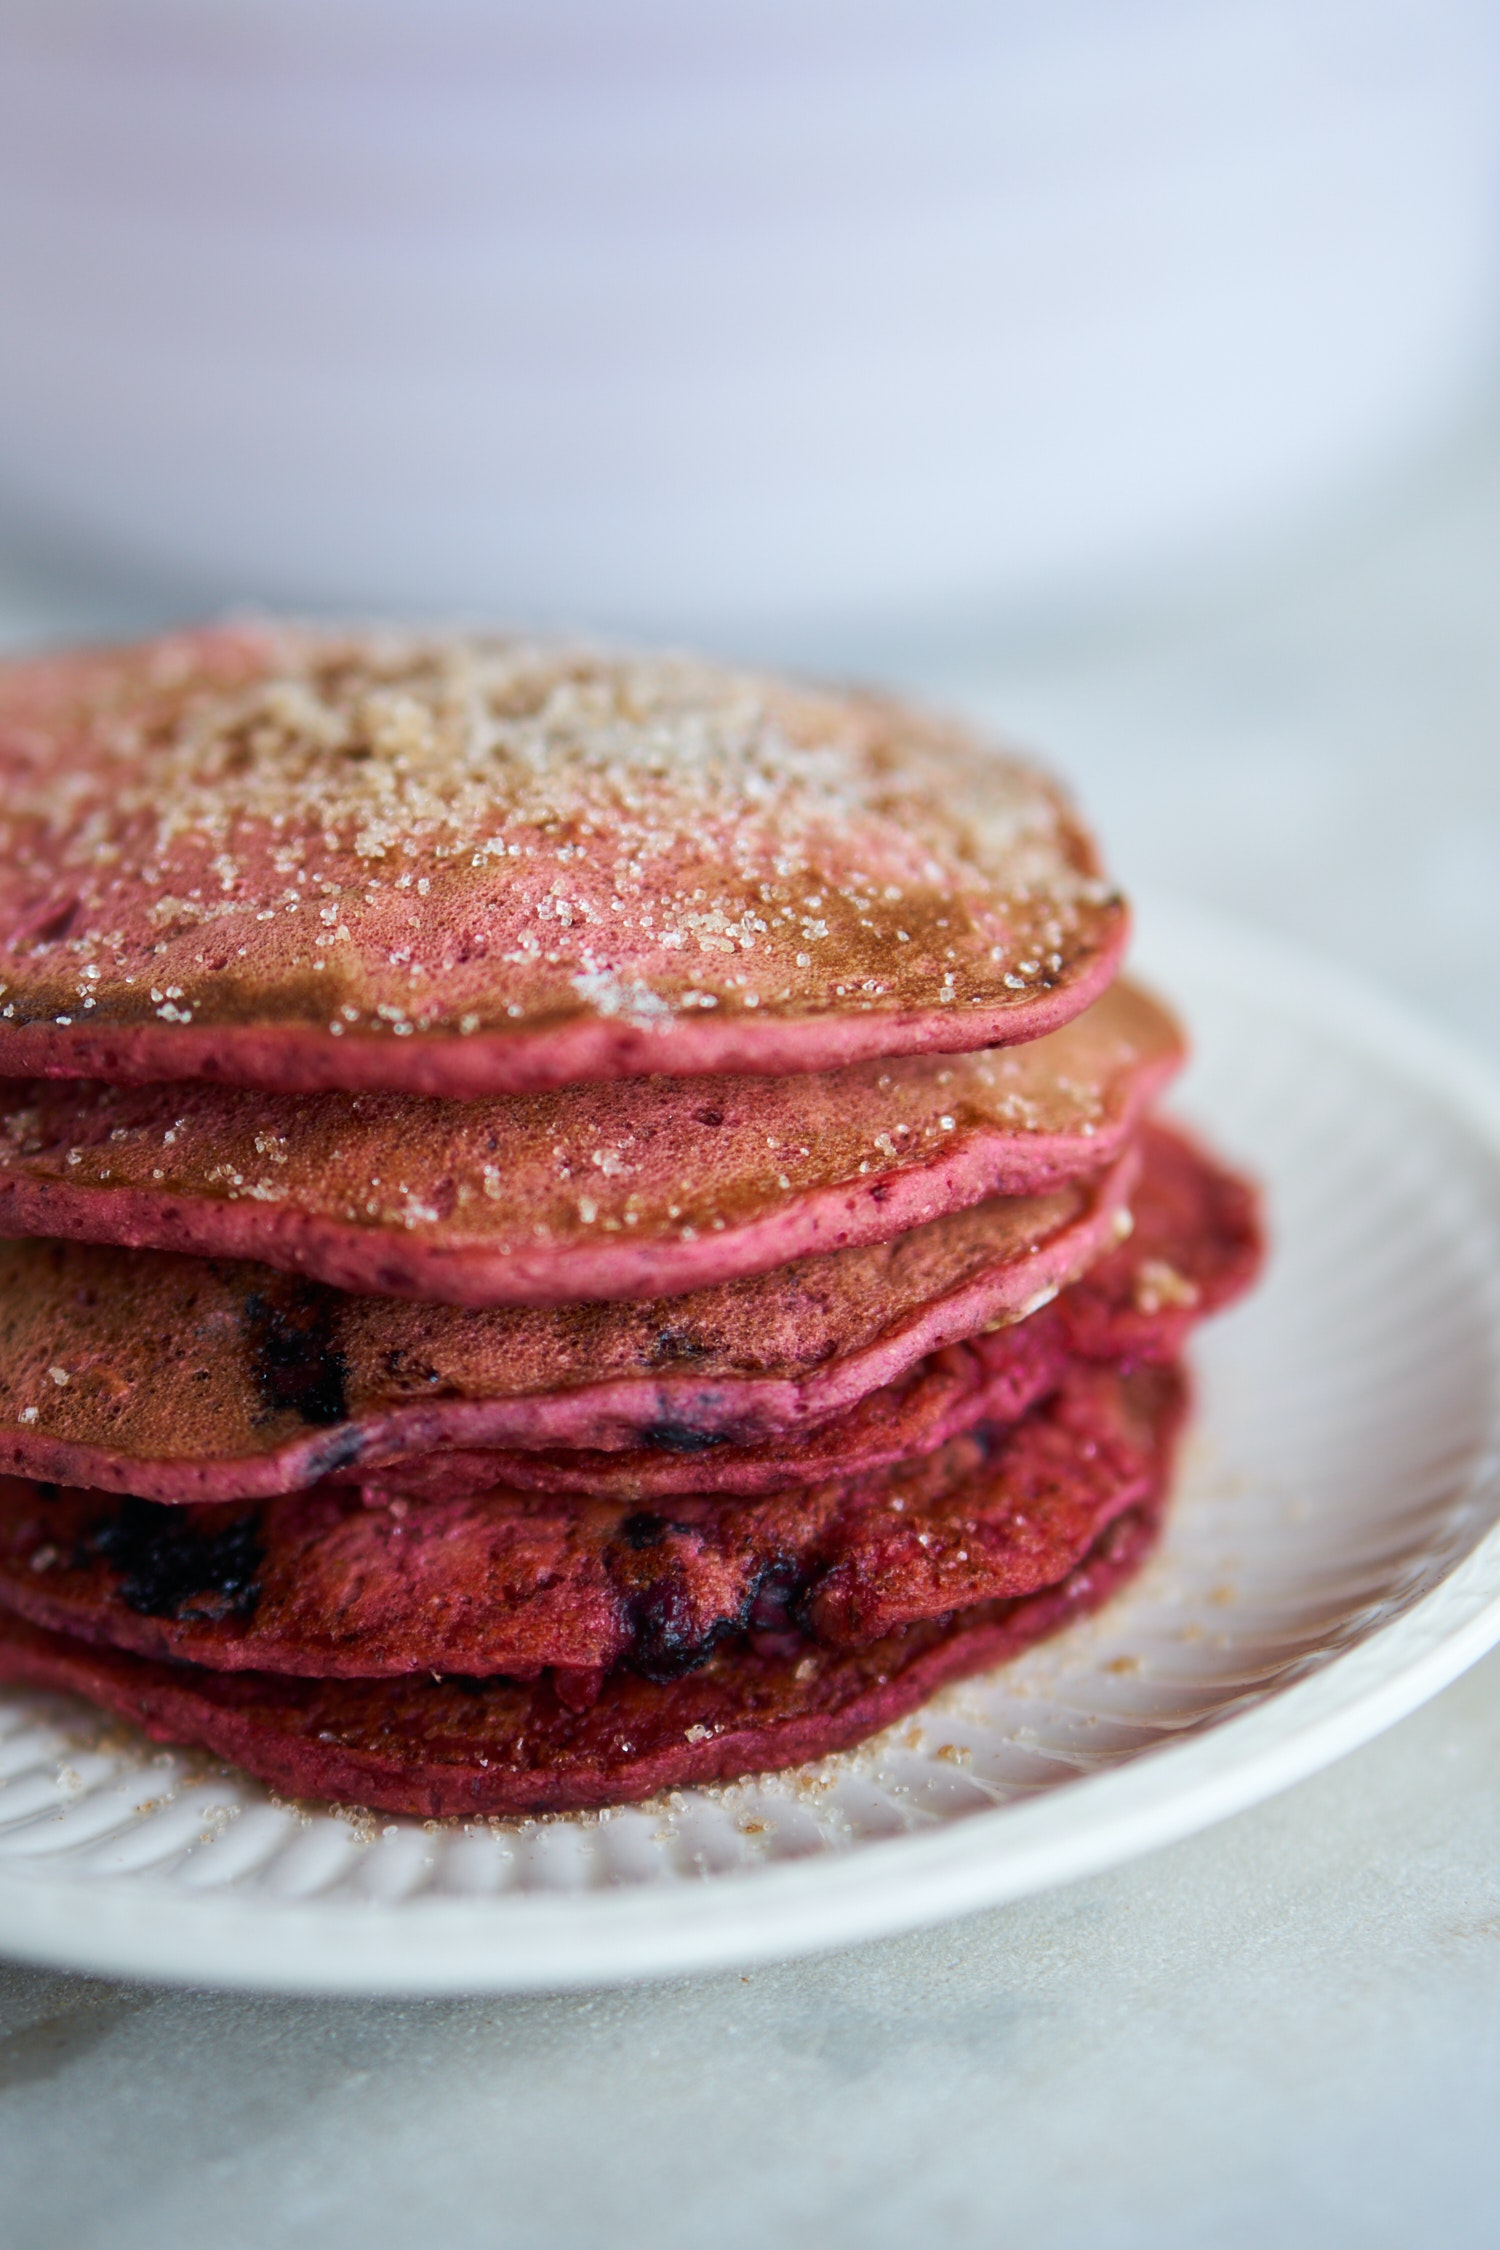 Blueberry Beet Pancakes